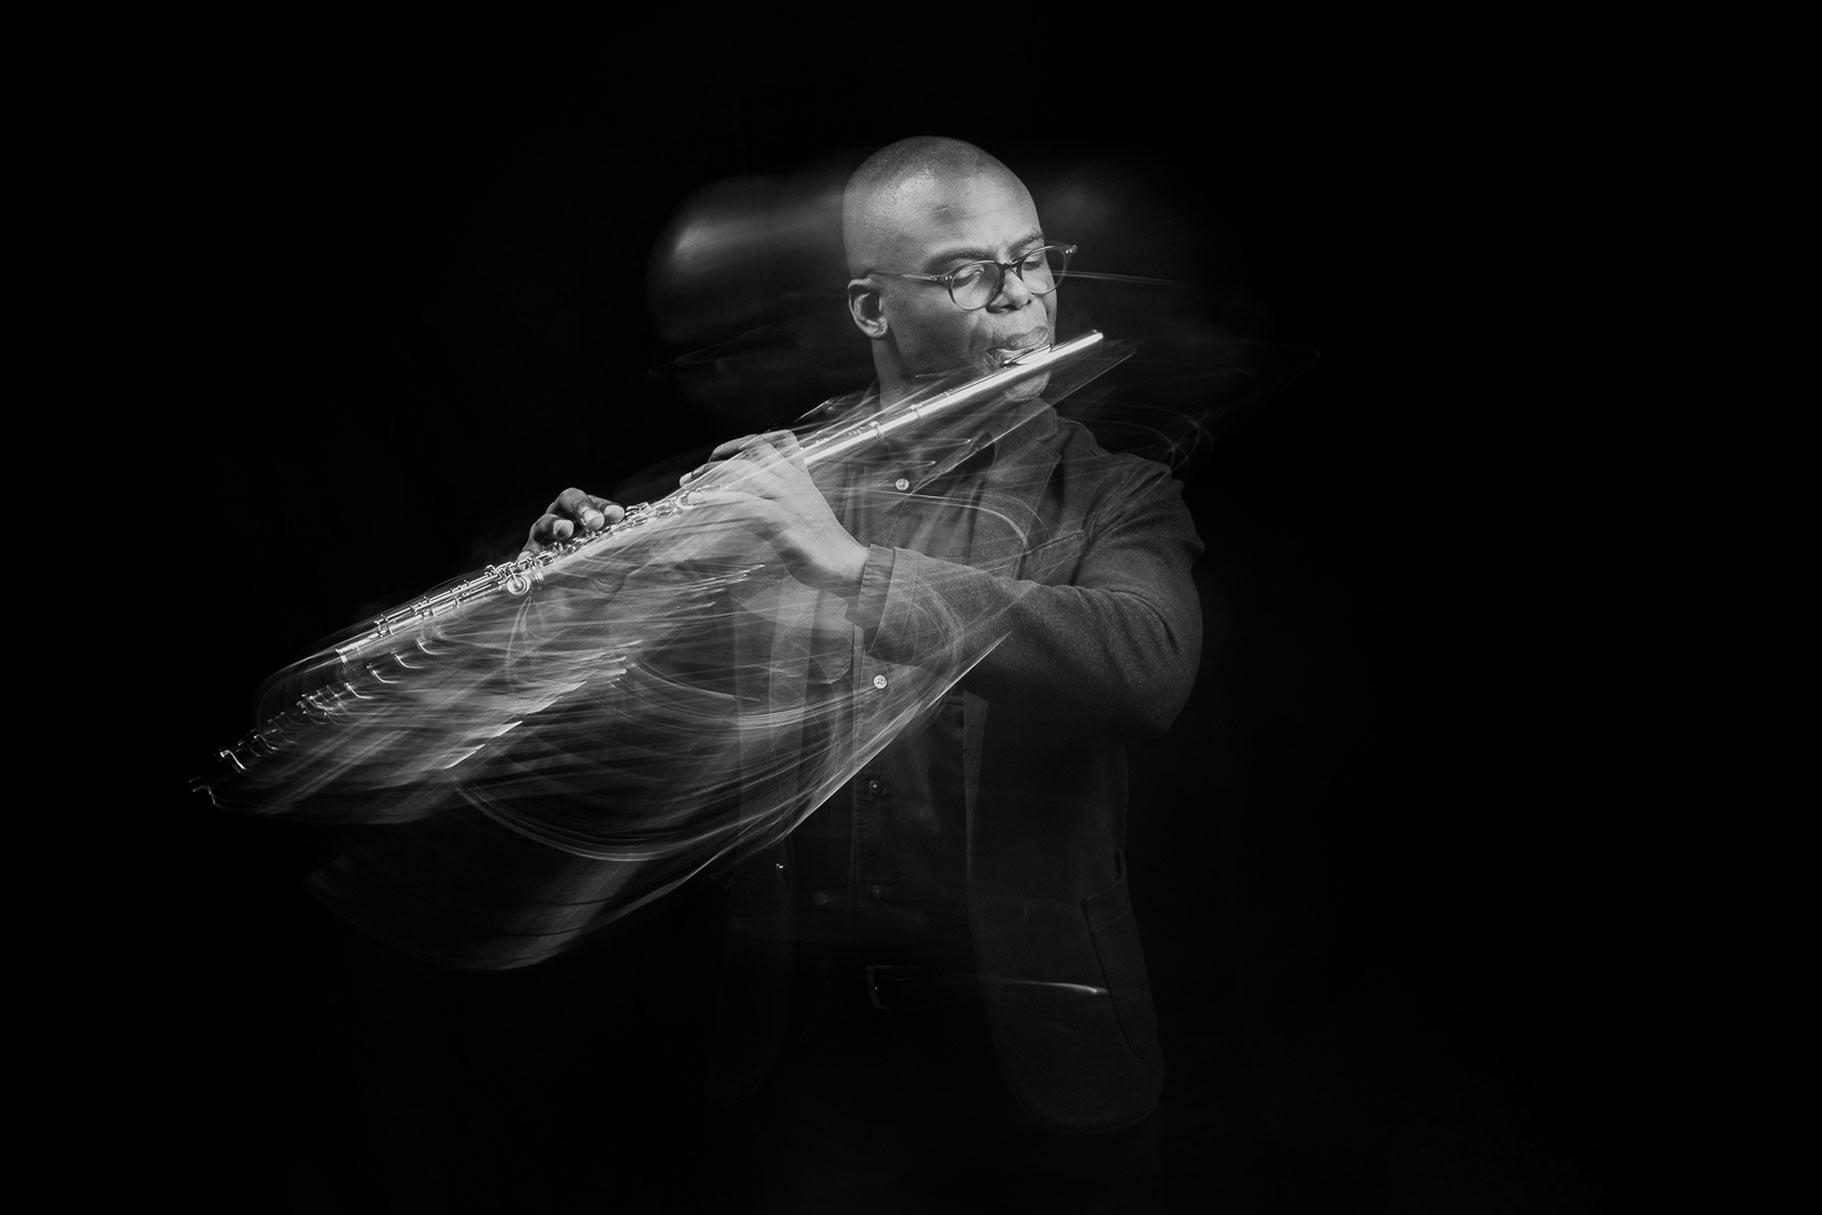 demarre_mcgill_seattle_symphony_flute_musician_brandon_patoc.jpg